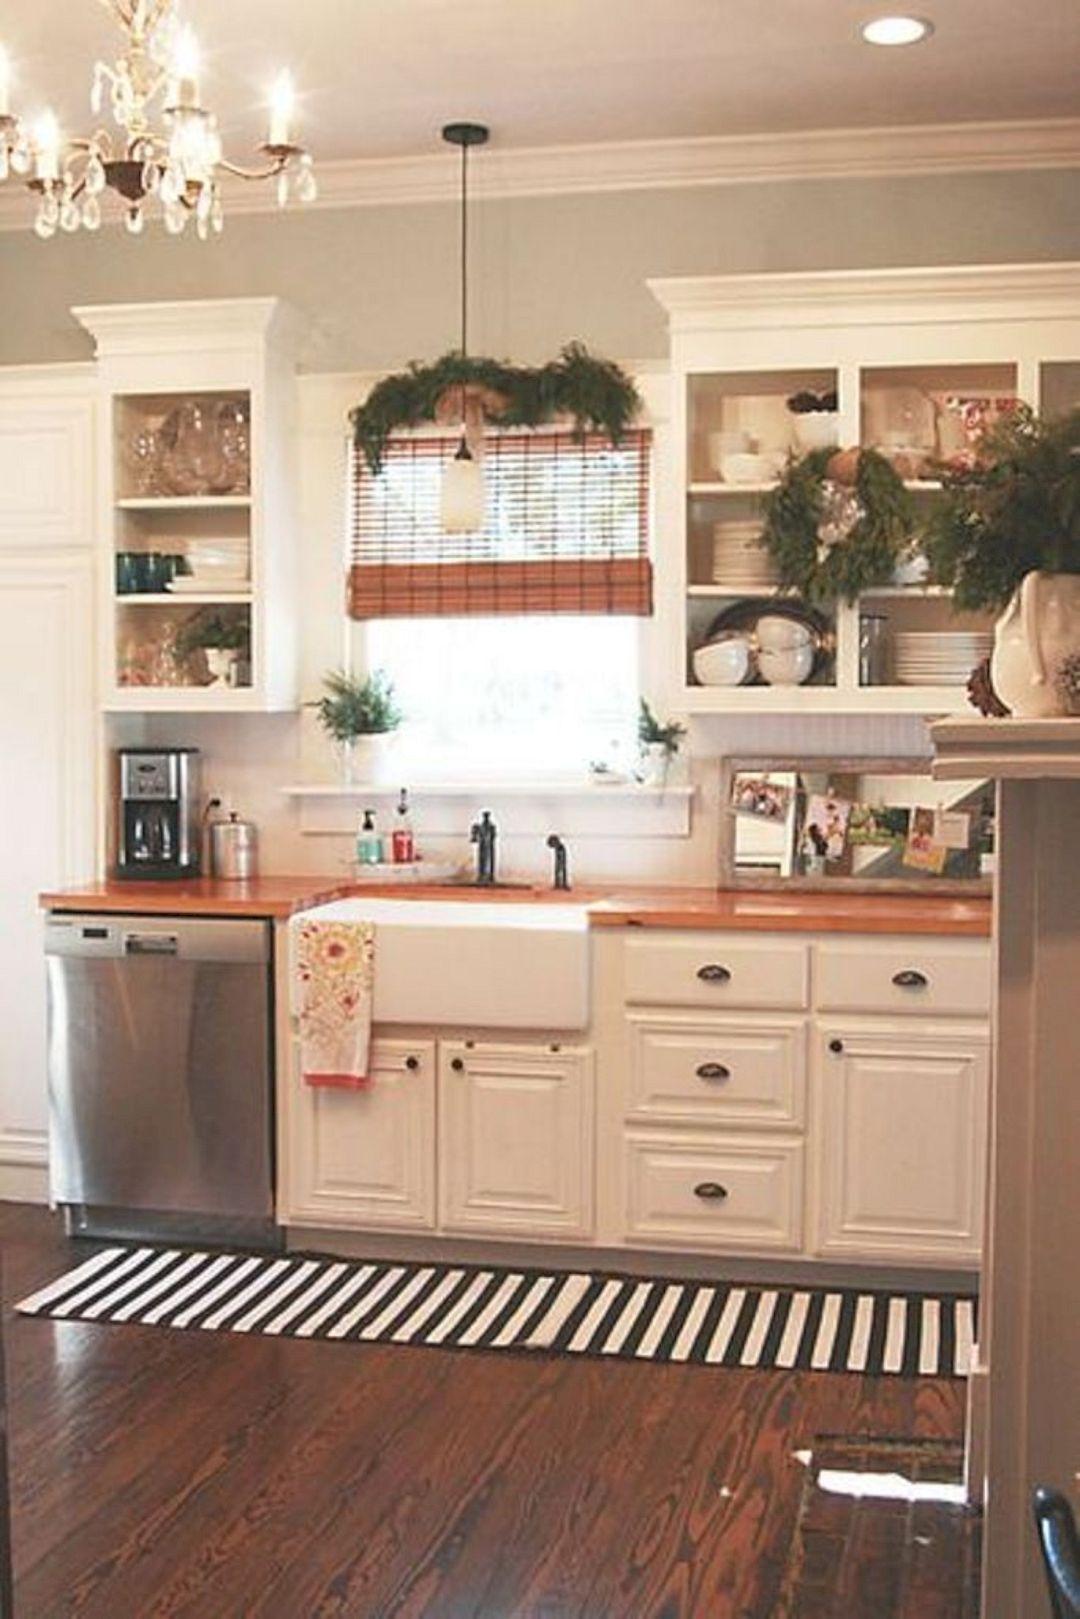 16 Small Cottage Interior Design Ideas